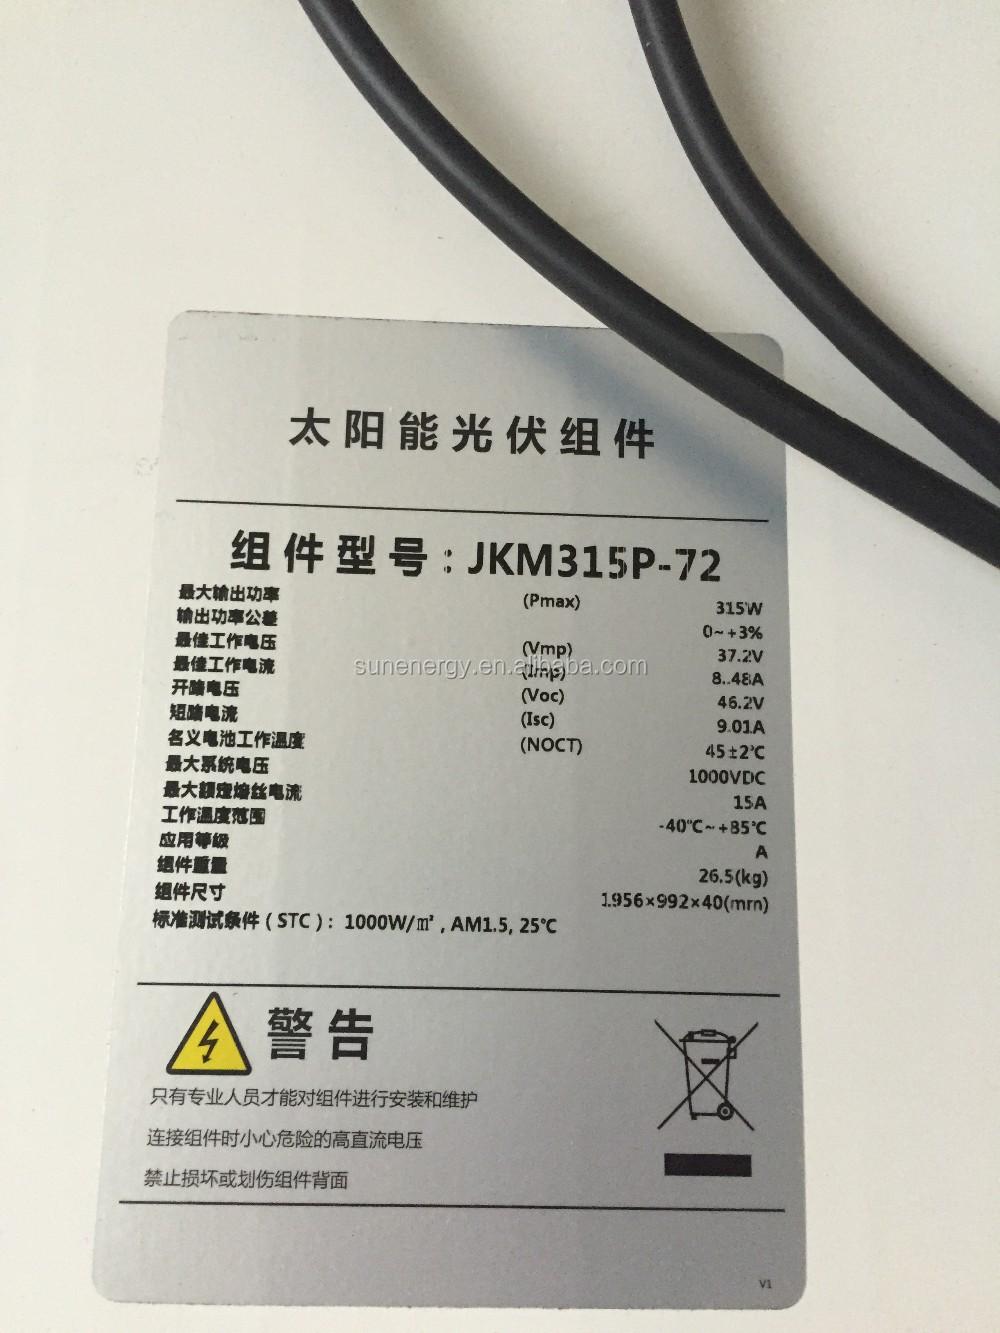 Jinko Solar 300w Poly Solar Panel Jkm300-72 B Grade - Buy Jinko Solar 300w  Poly Solar Panel,Jkm305p-72,Jkm300-72 Product on Alibaba com